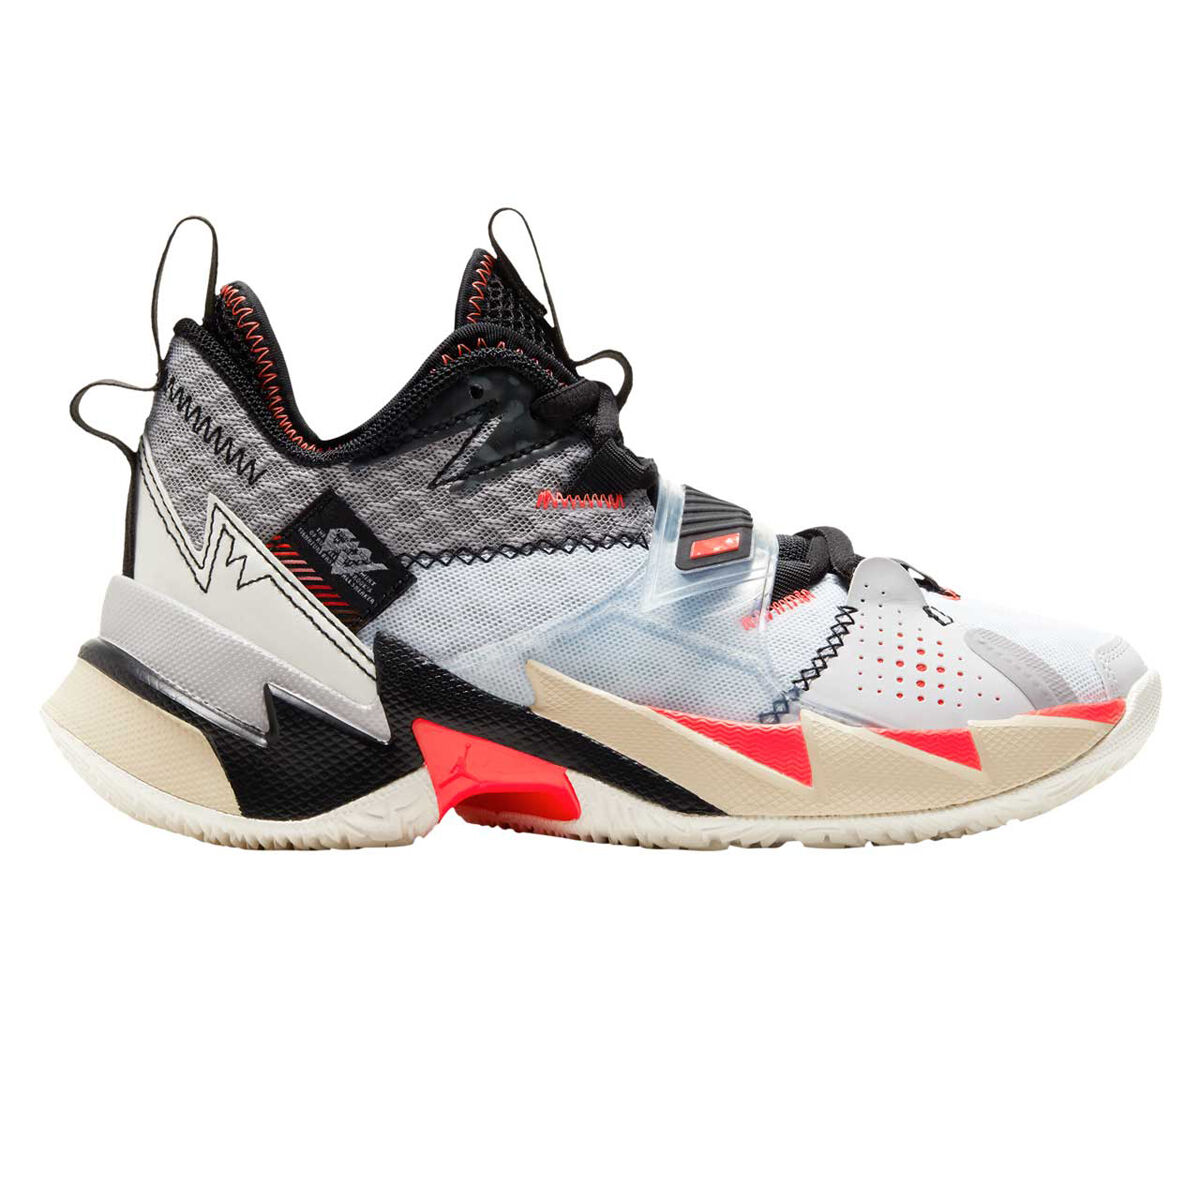 Nike Air Jordan Why Not Zer0.3 Kids